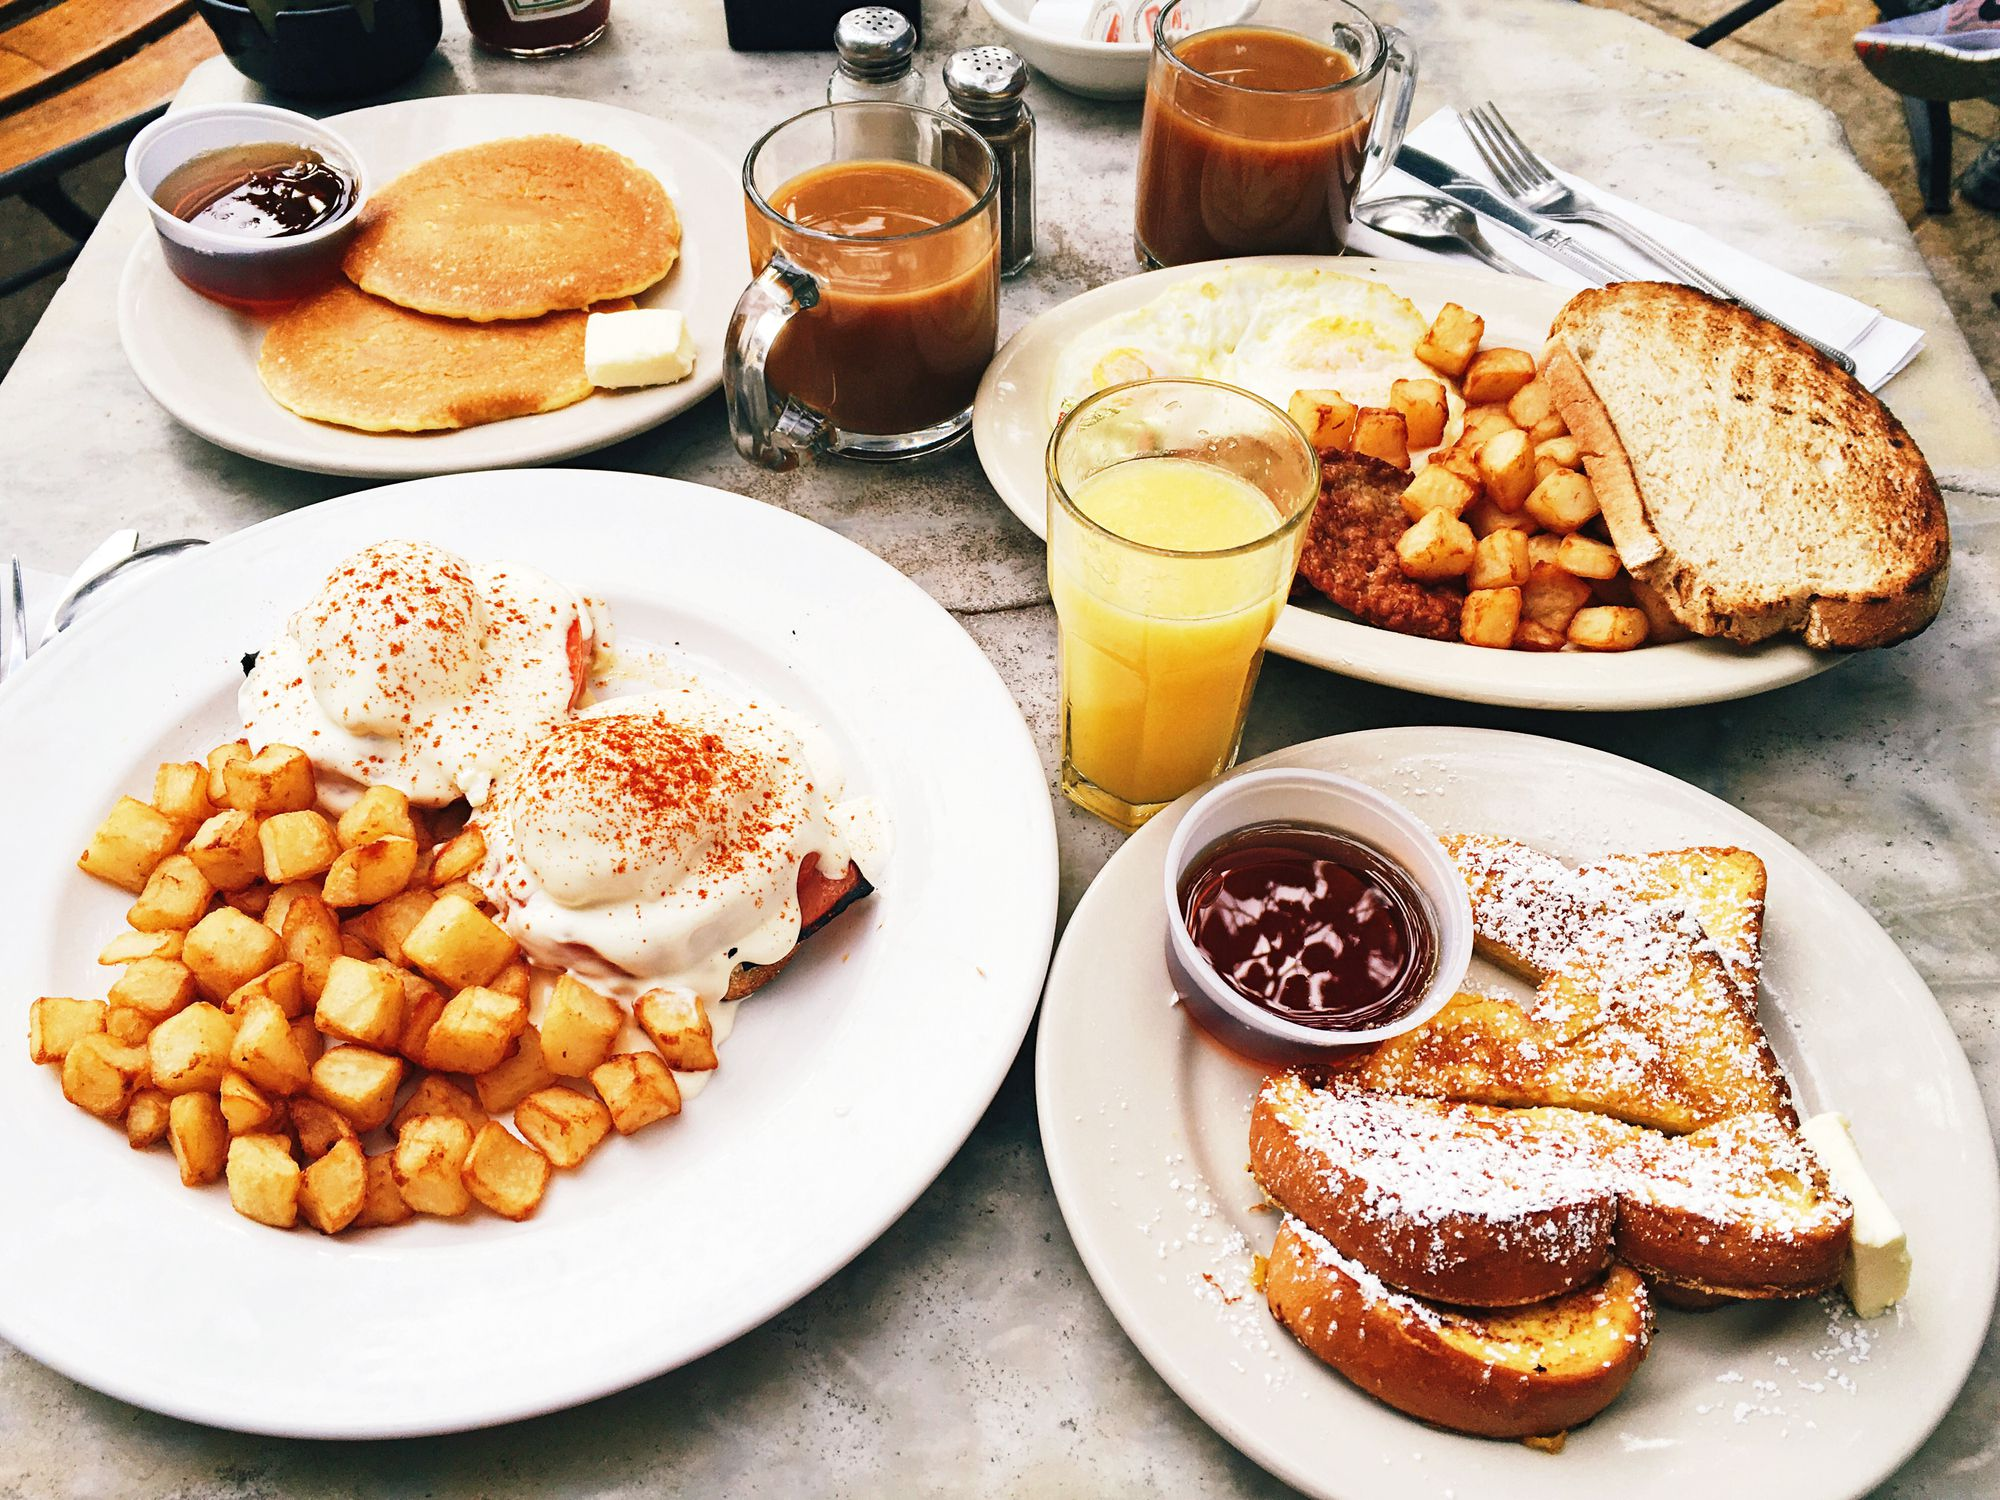 10 Great Restaurants for Outdoor Brunch in Manhattan